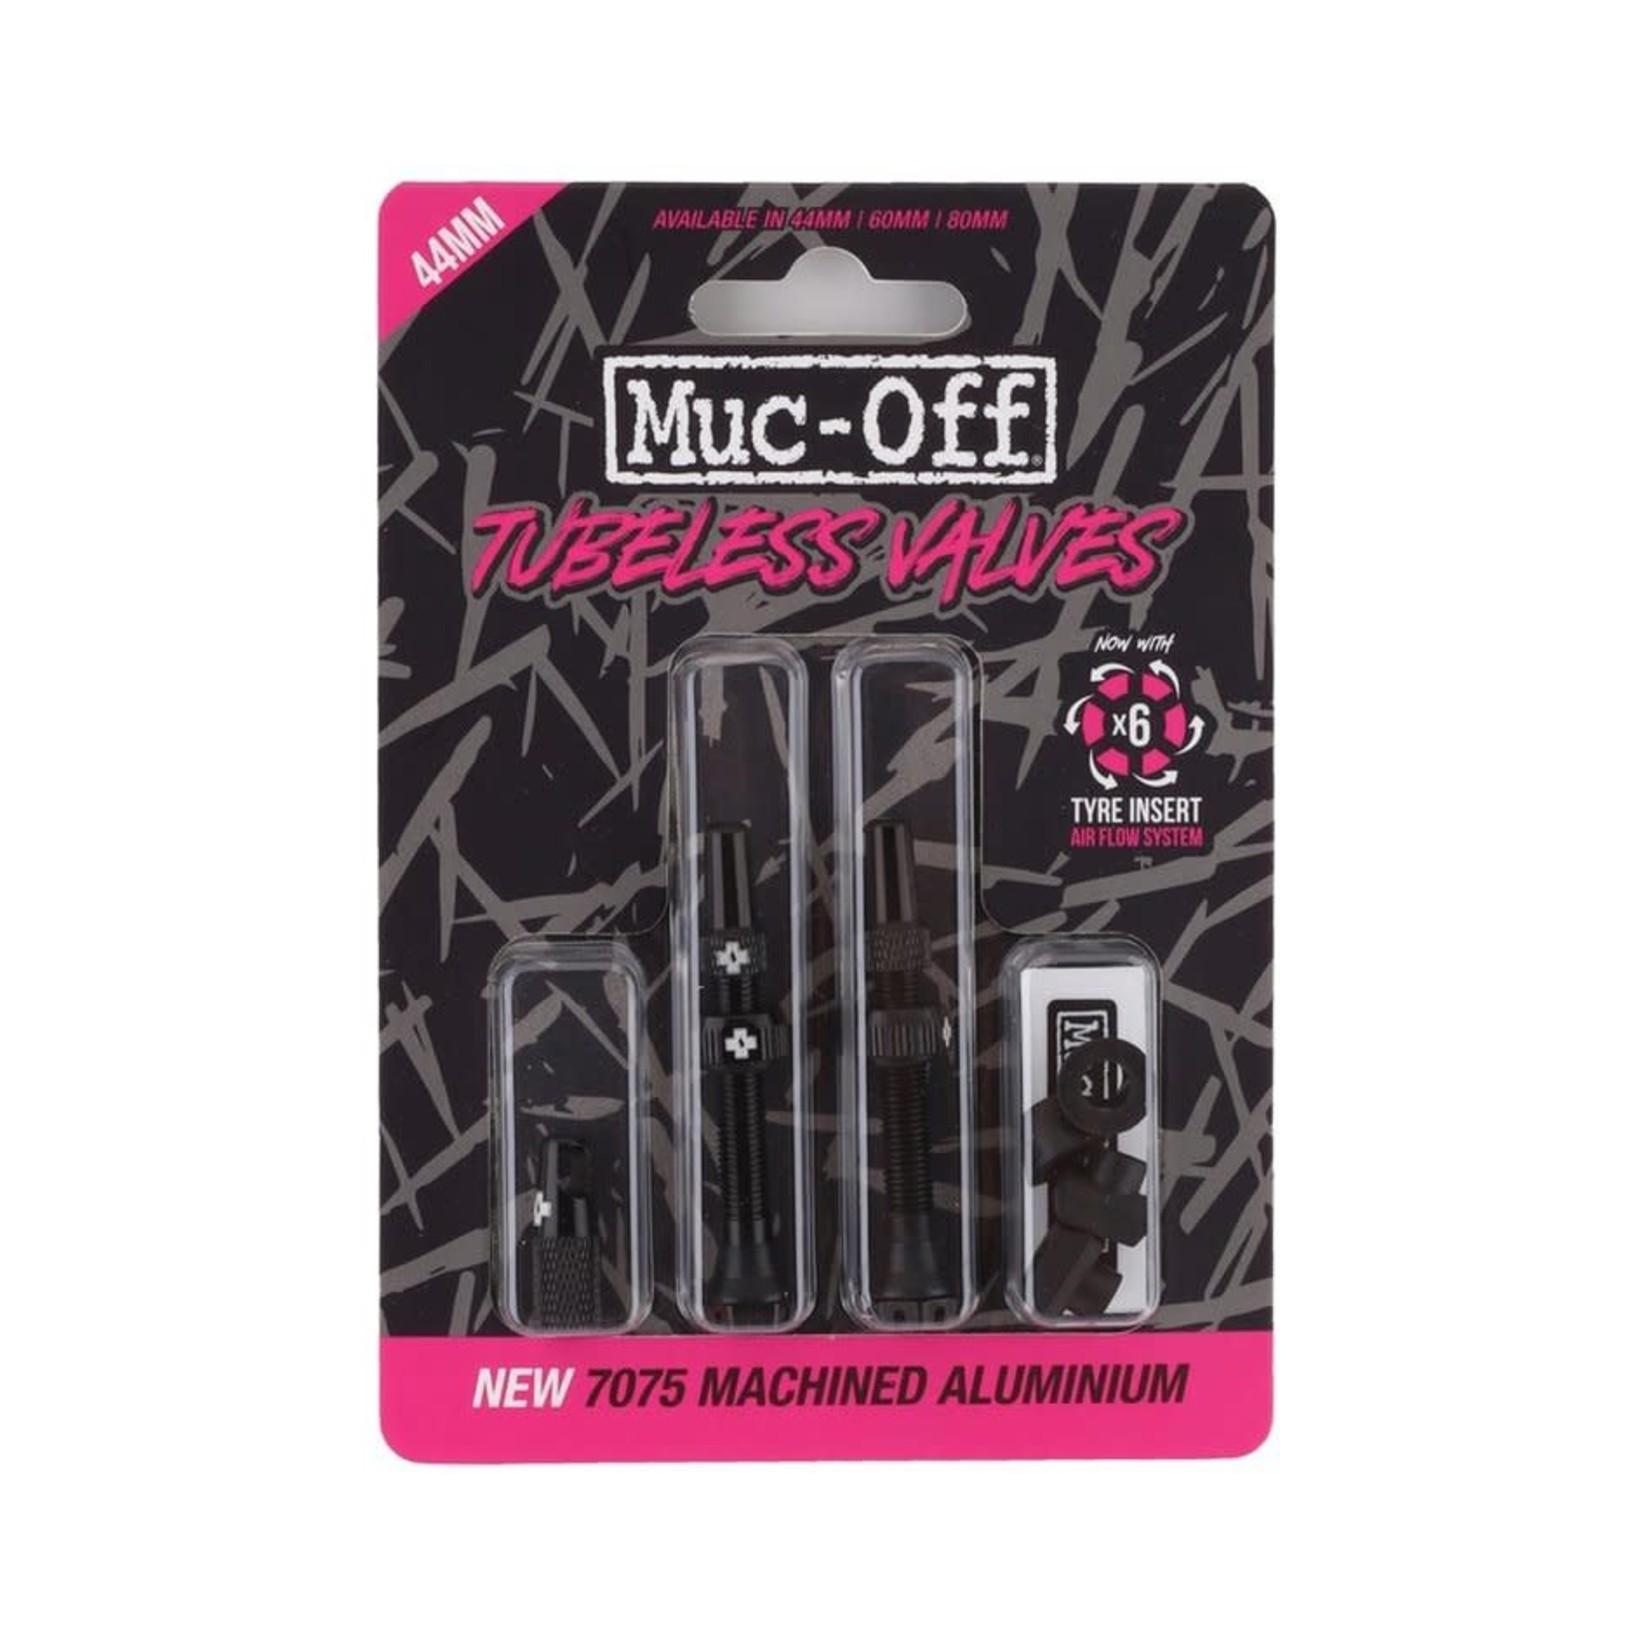 Muc-Off MUC-OFF - valvola tubeless V2 - Black